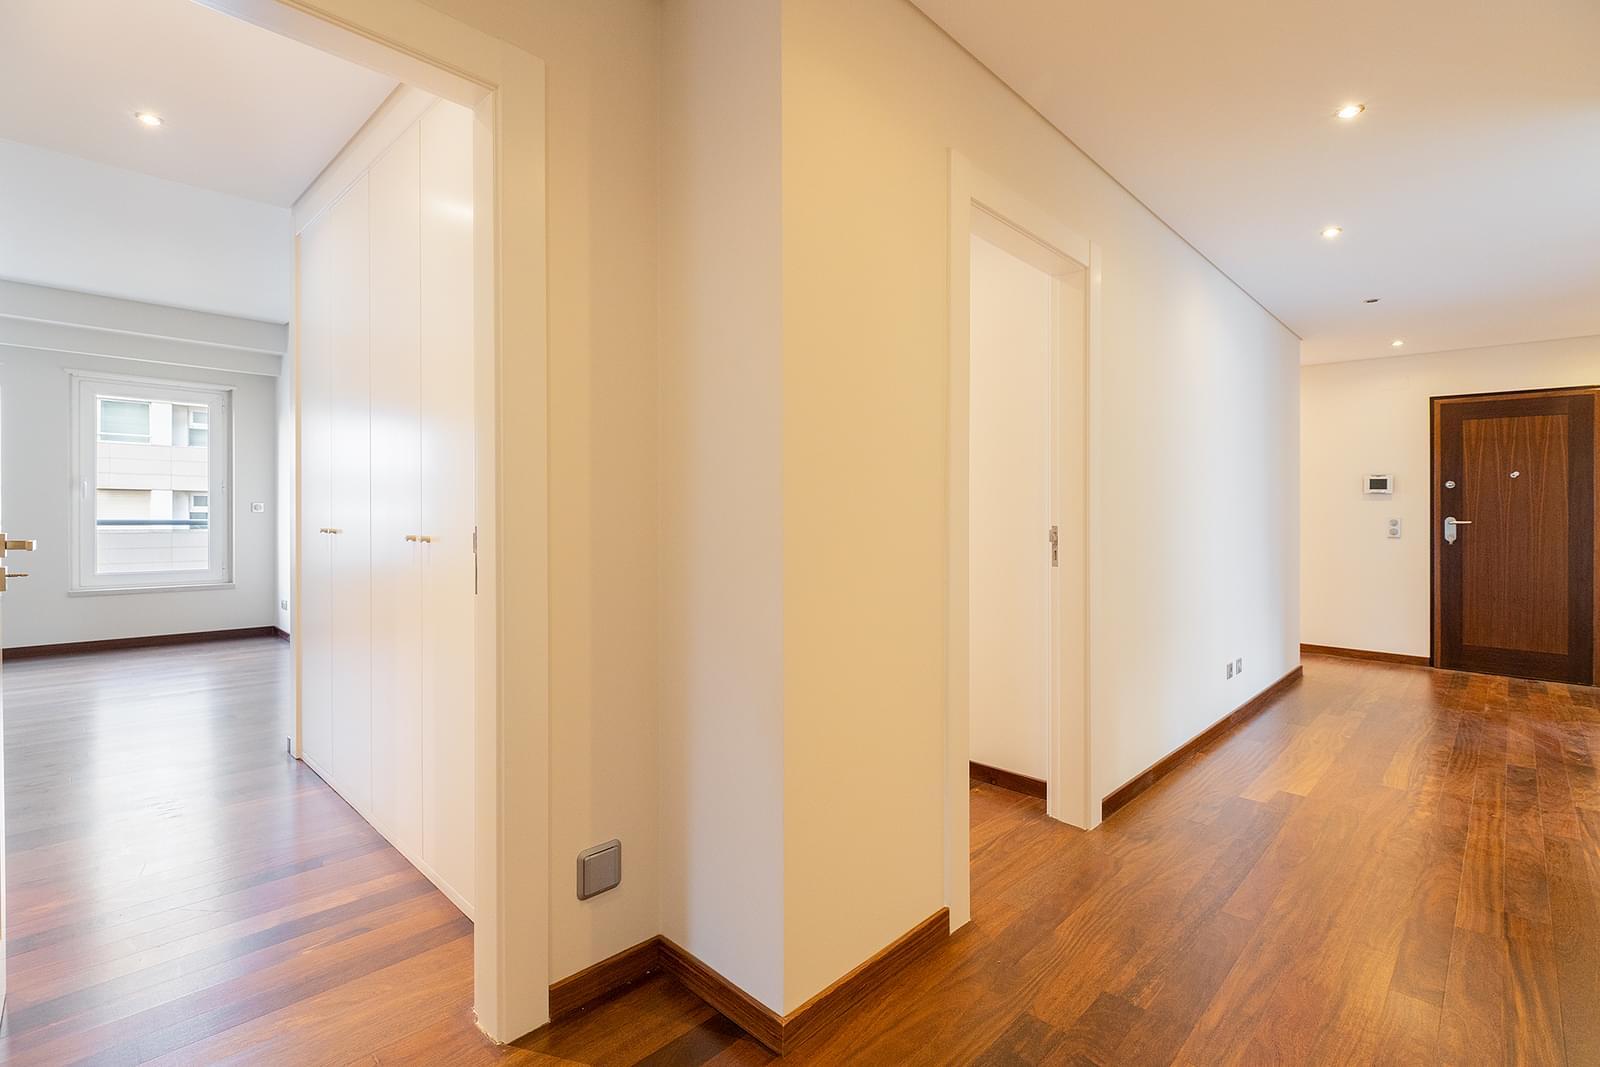 pf18533-apartamento-t4-lisboa-0347b33a-4909-42ed-a499-5792f93059bf